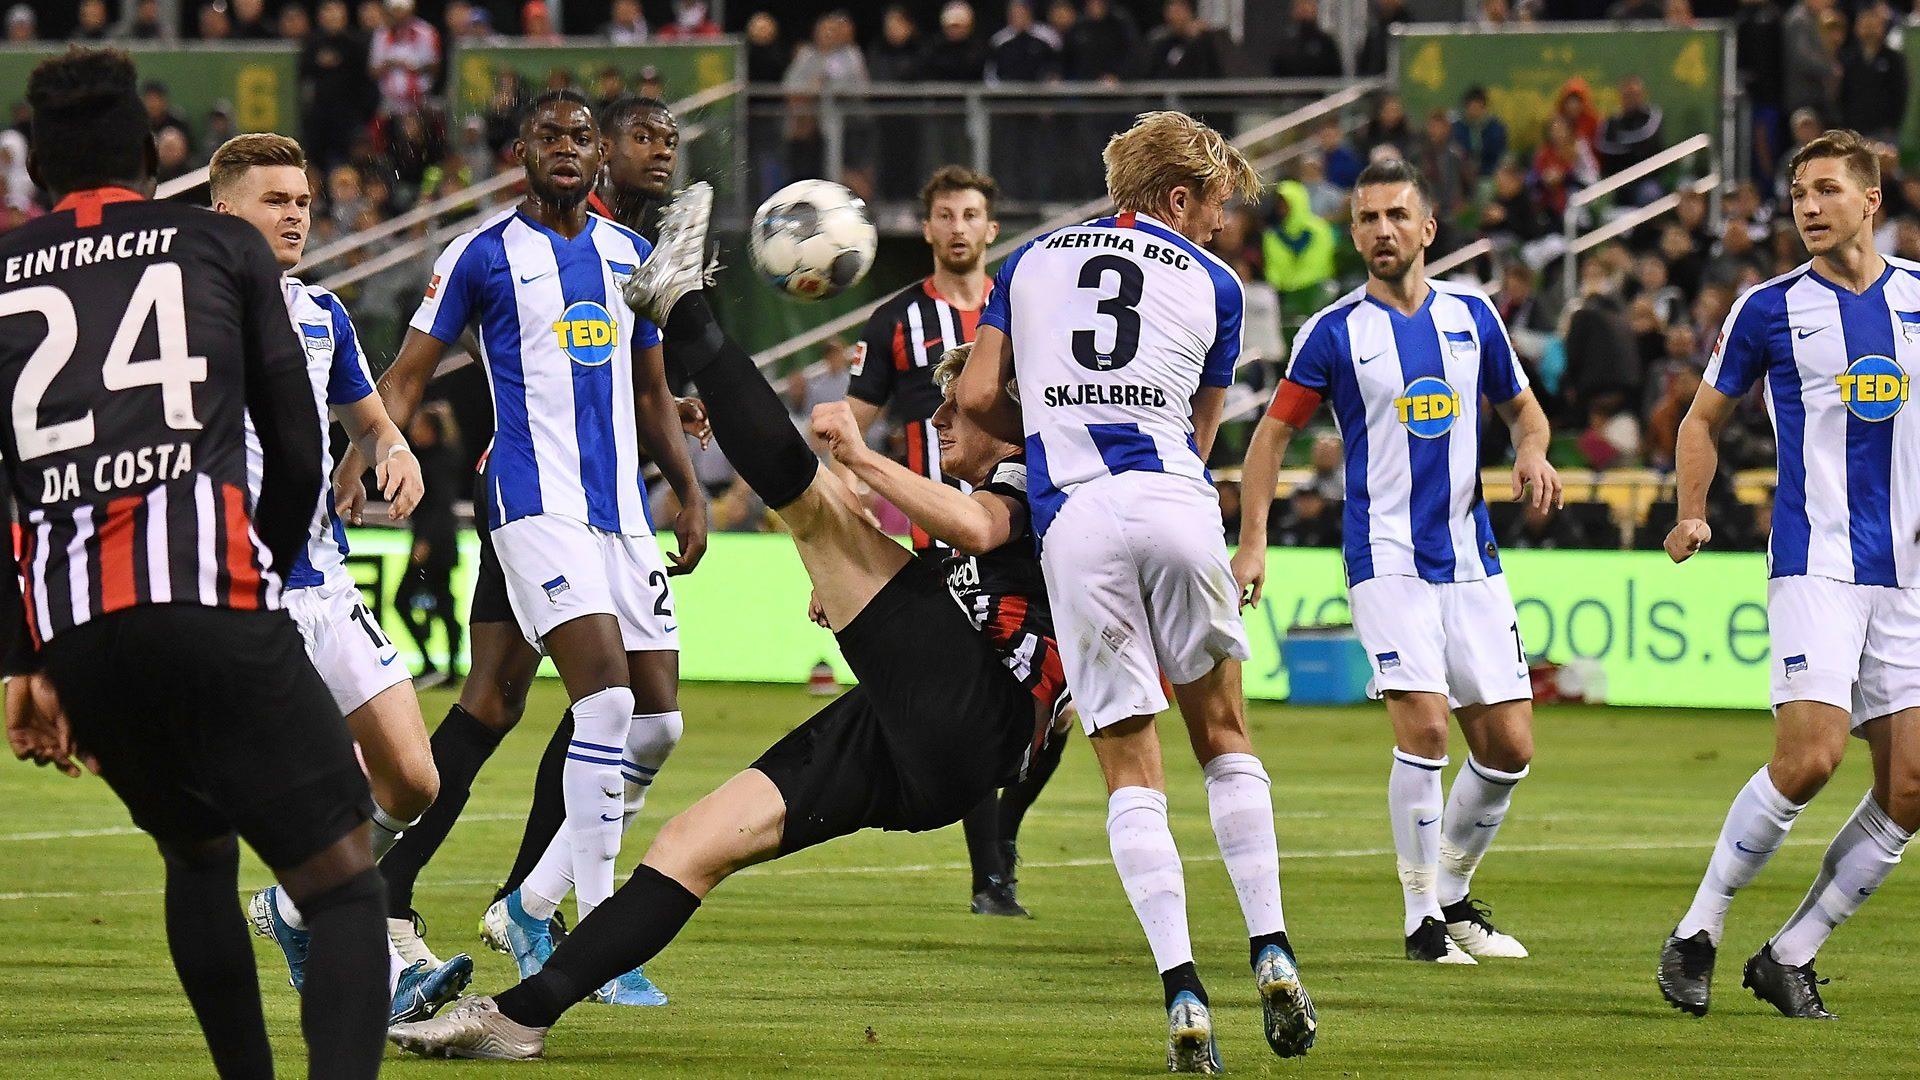 Hertha overcome Frankfurt in Florida exhibition match